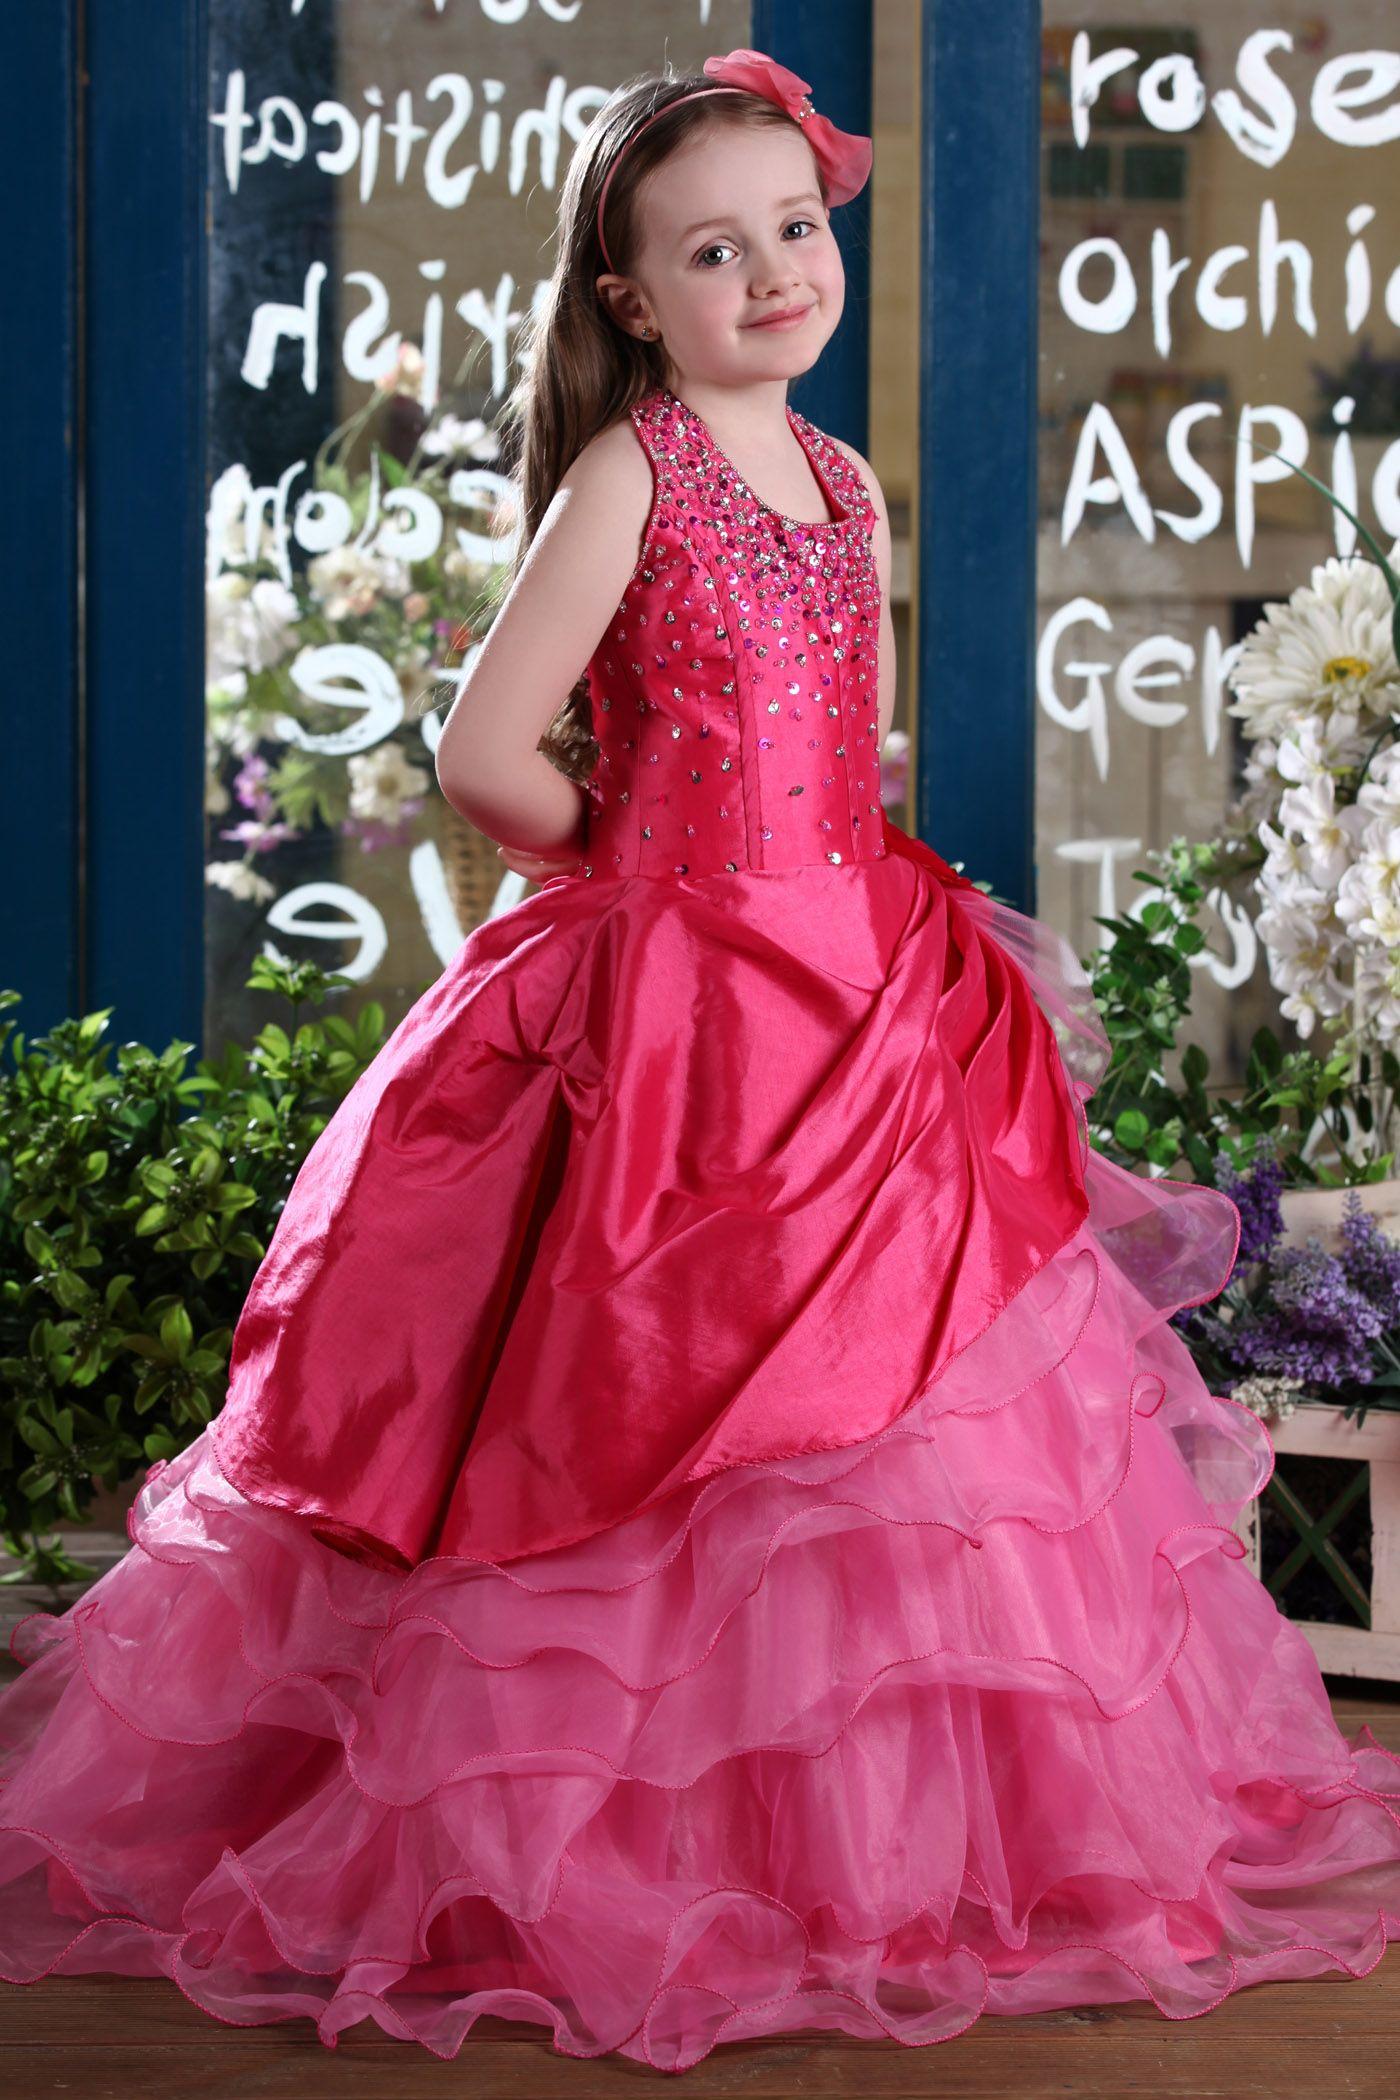 5c9ef93a8 Concise Ball Gown Halter Floor-length Sequins & Flower Embellishing Flower  Girl Dress #ericdressreviews,#ericdress fashion reviews,#ericdress beauty  reviews ...